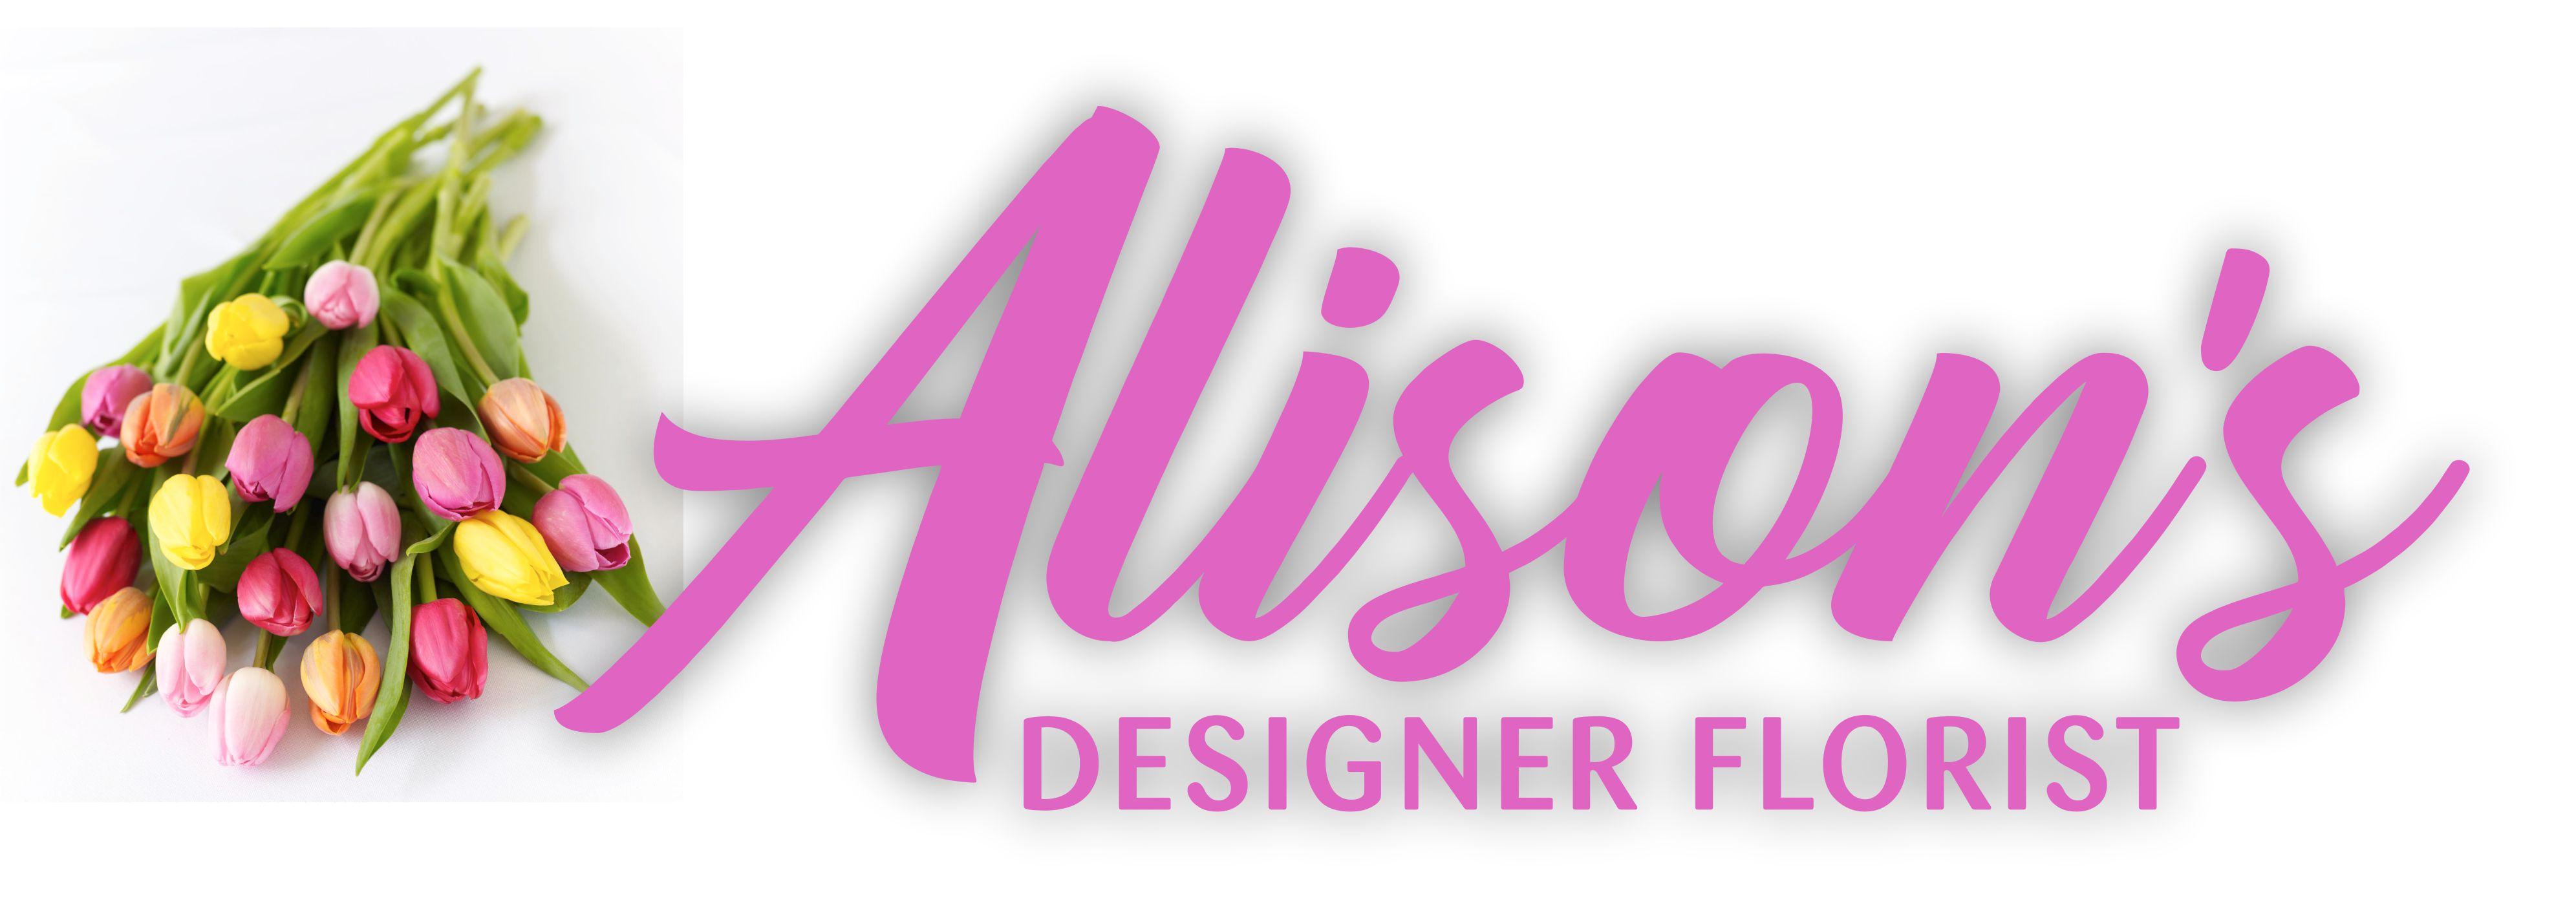 Alison's Designer Florist ltd